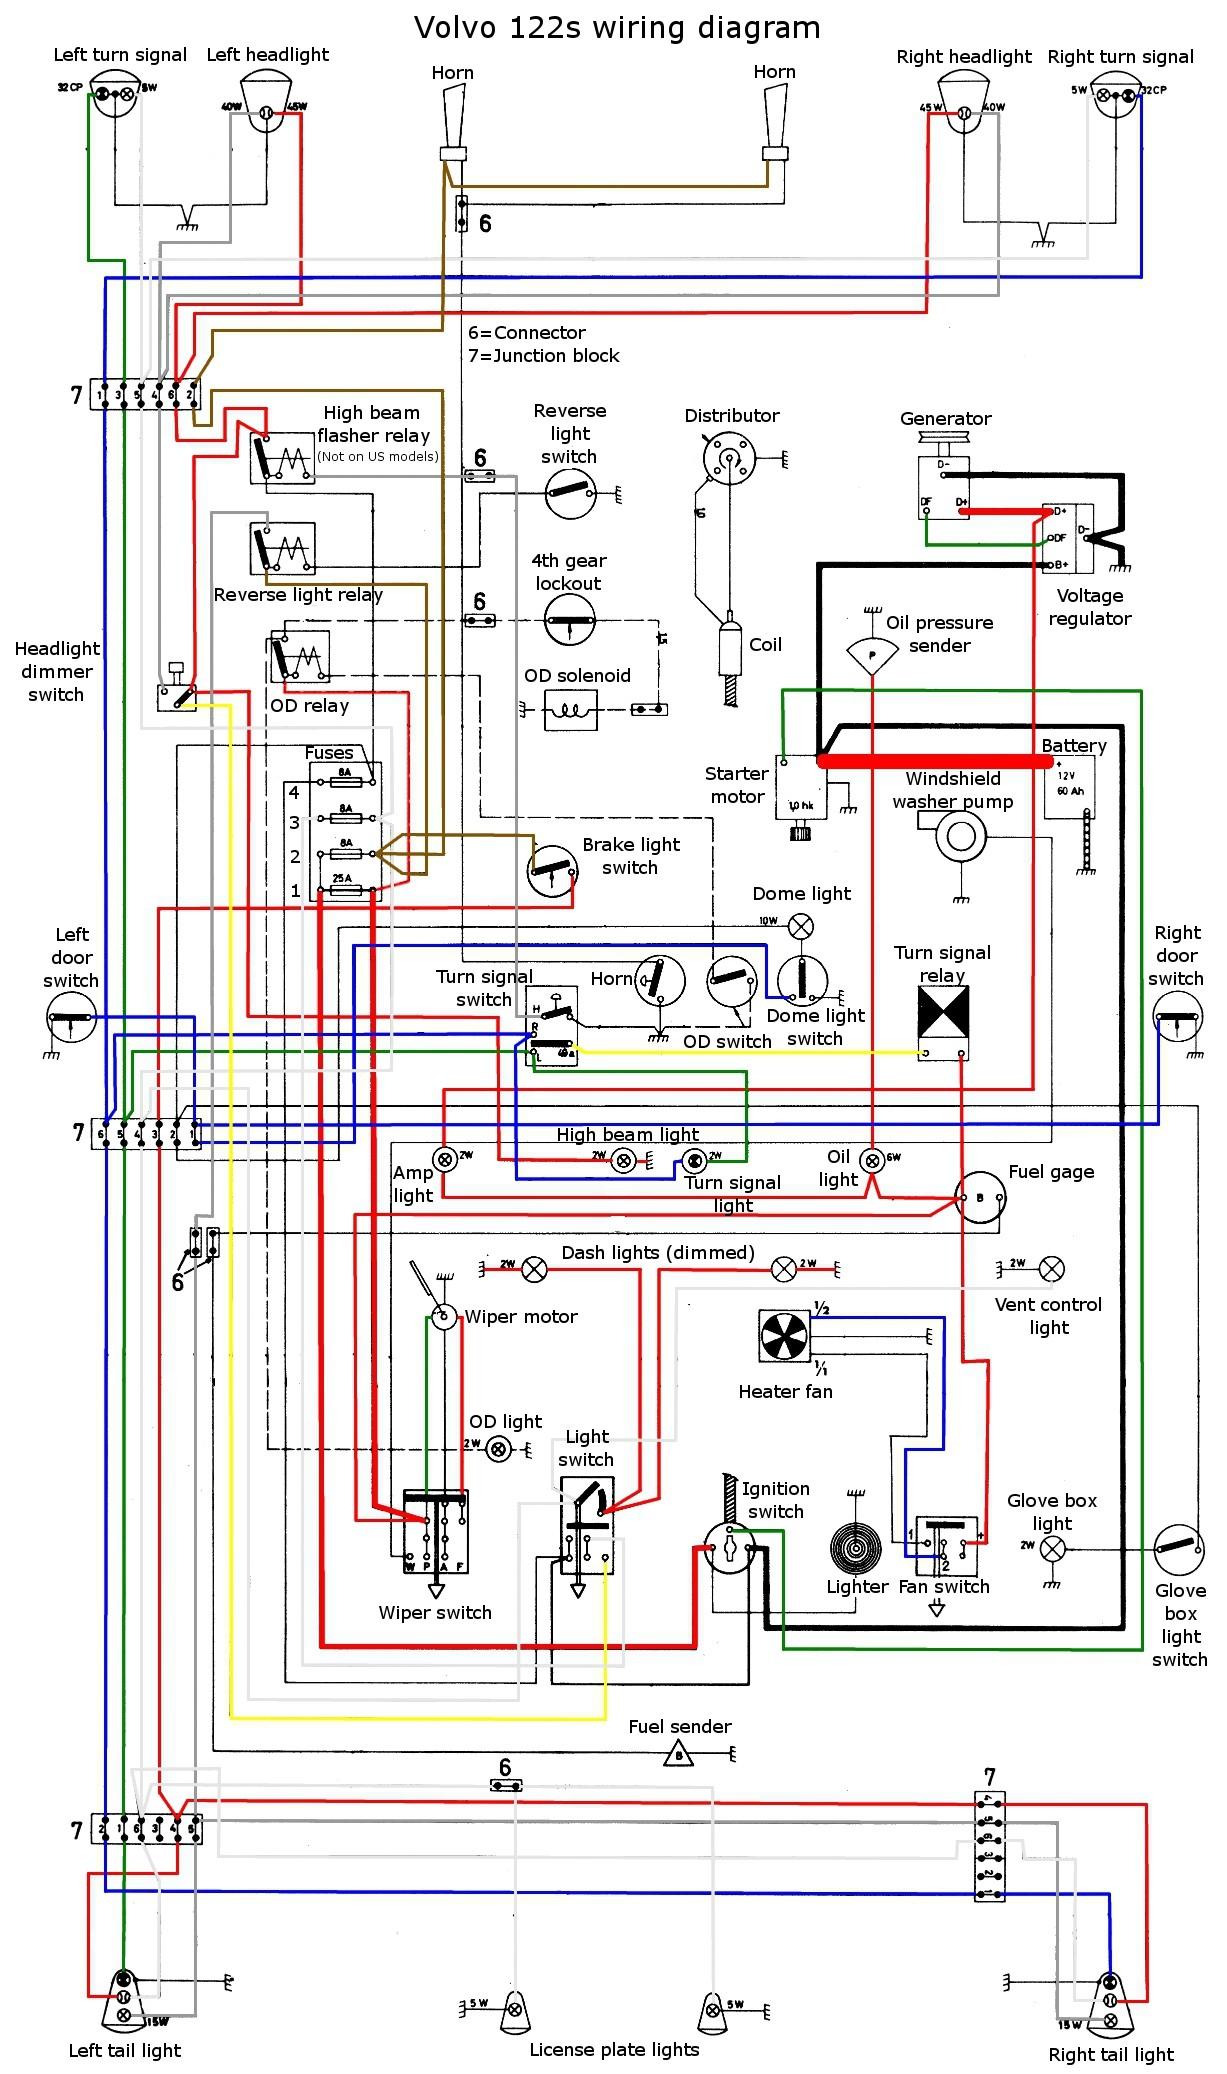 Engine Wiring Chrysler Pacifica Wiring Diagram Diagrams Engine Harness Amp Chrysler  Pacifica Wiring Diagram 90 Wiring Diagrams